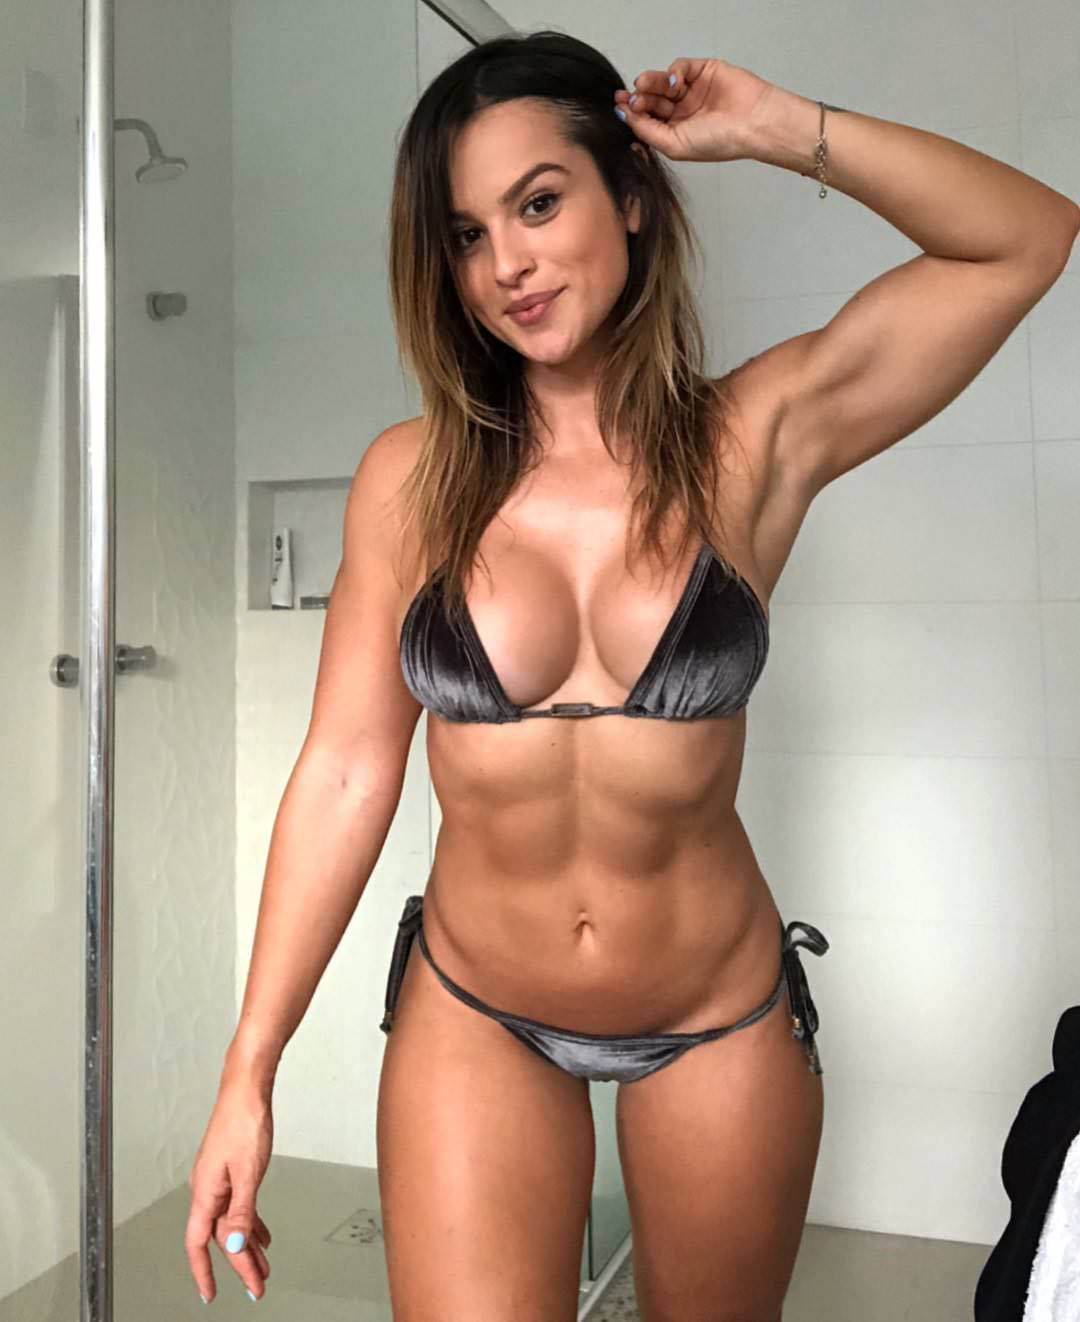 Alice Porno alice matos porn pic - eporner